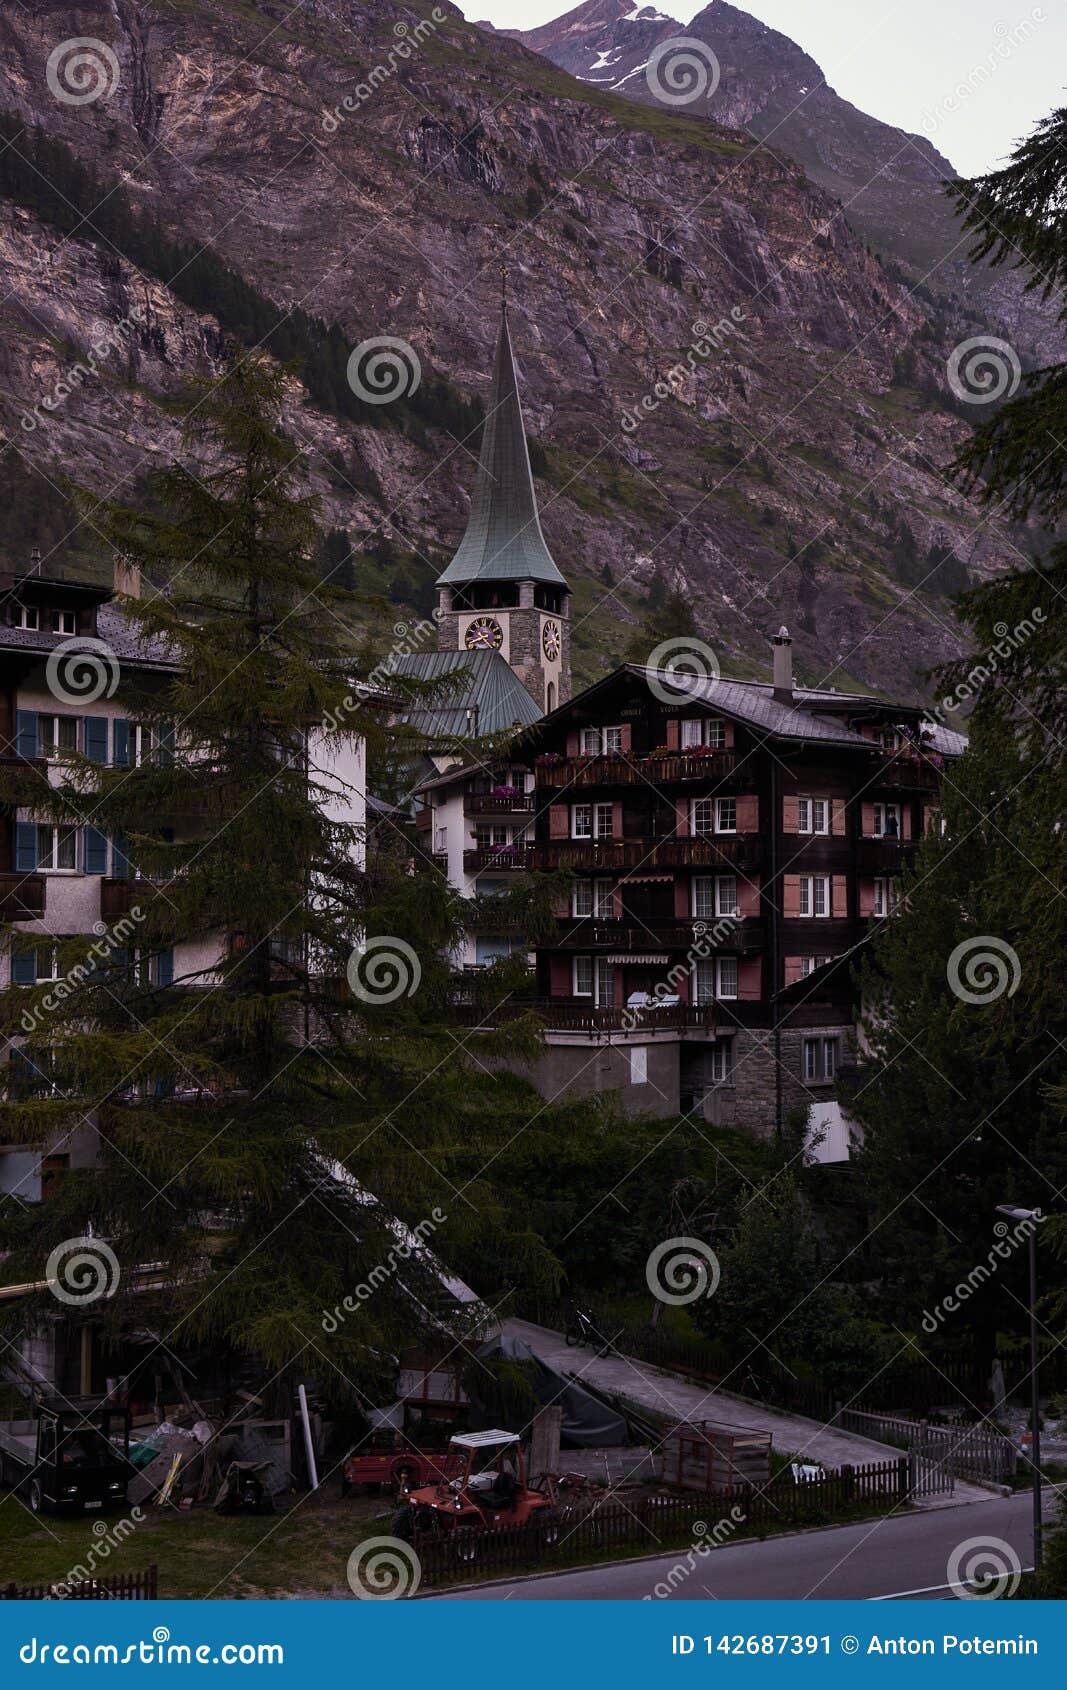 Small church in Zermatt and alpine house